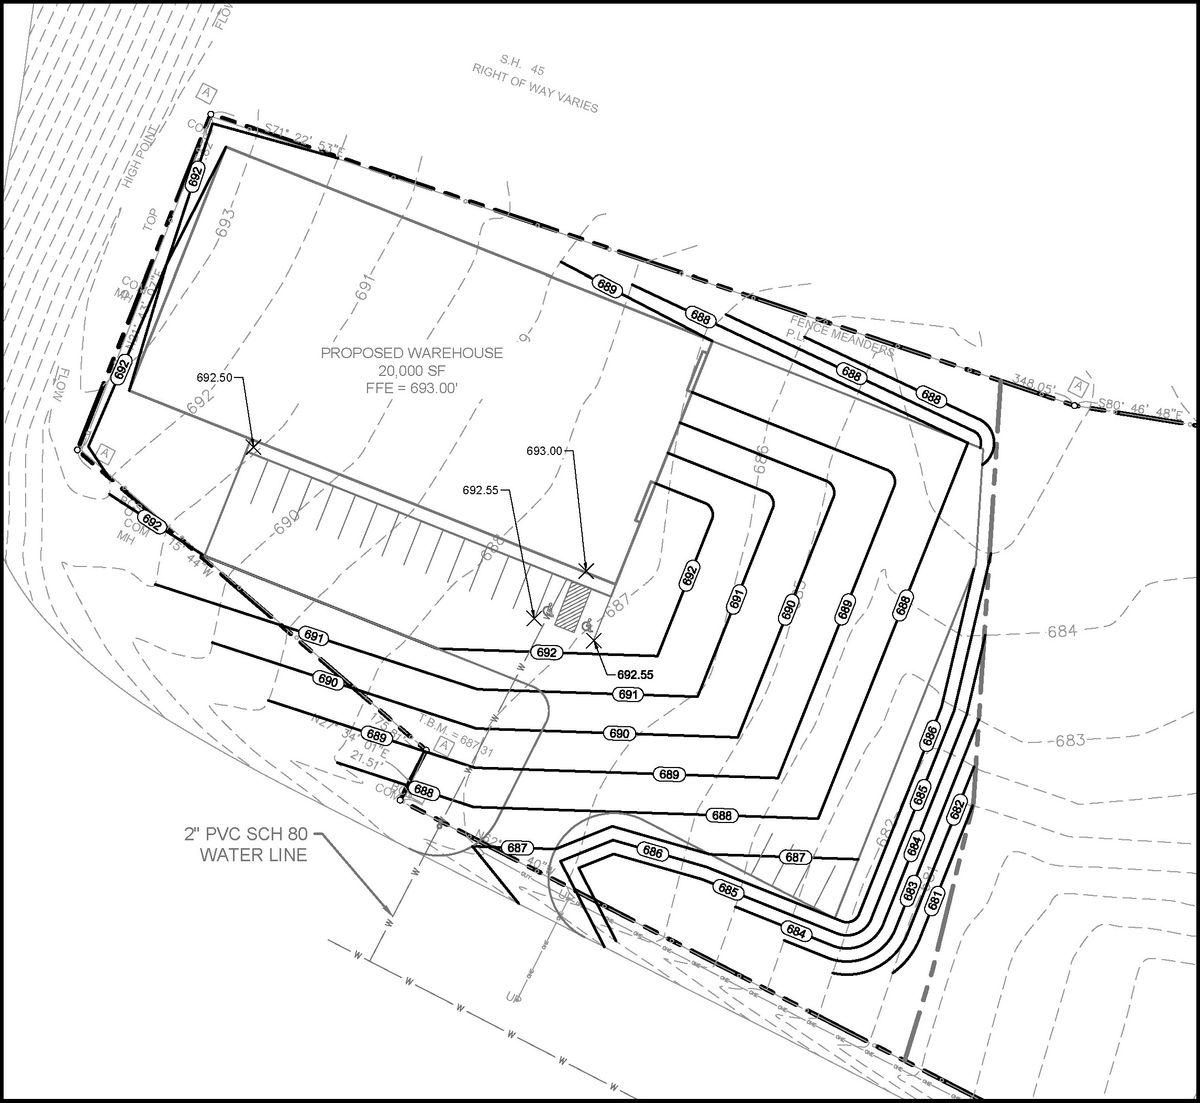 2019-08-16_Creedmoor Warehouses_Signed Plan Set (5)_Page_09.jpg